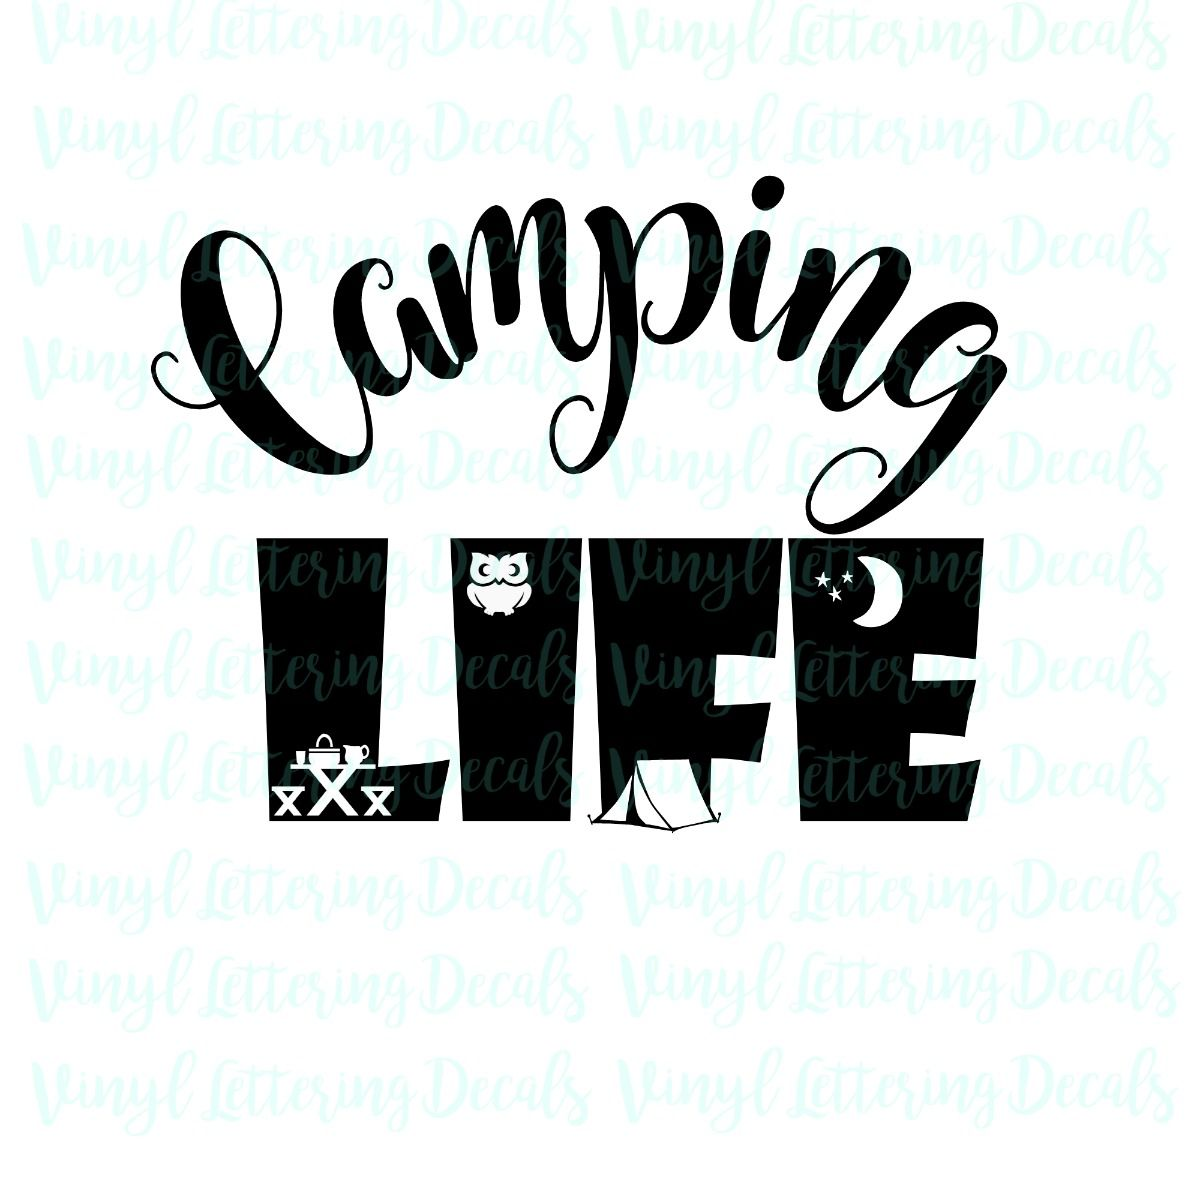 Camping life, SVG file, Cricut file, Cameo file